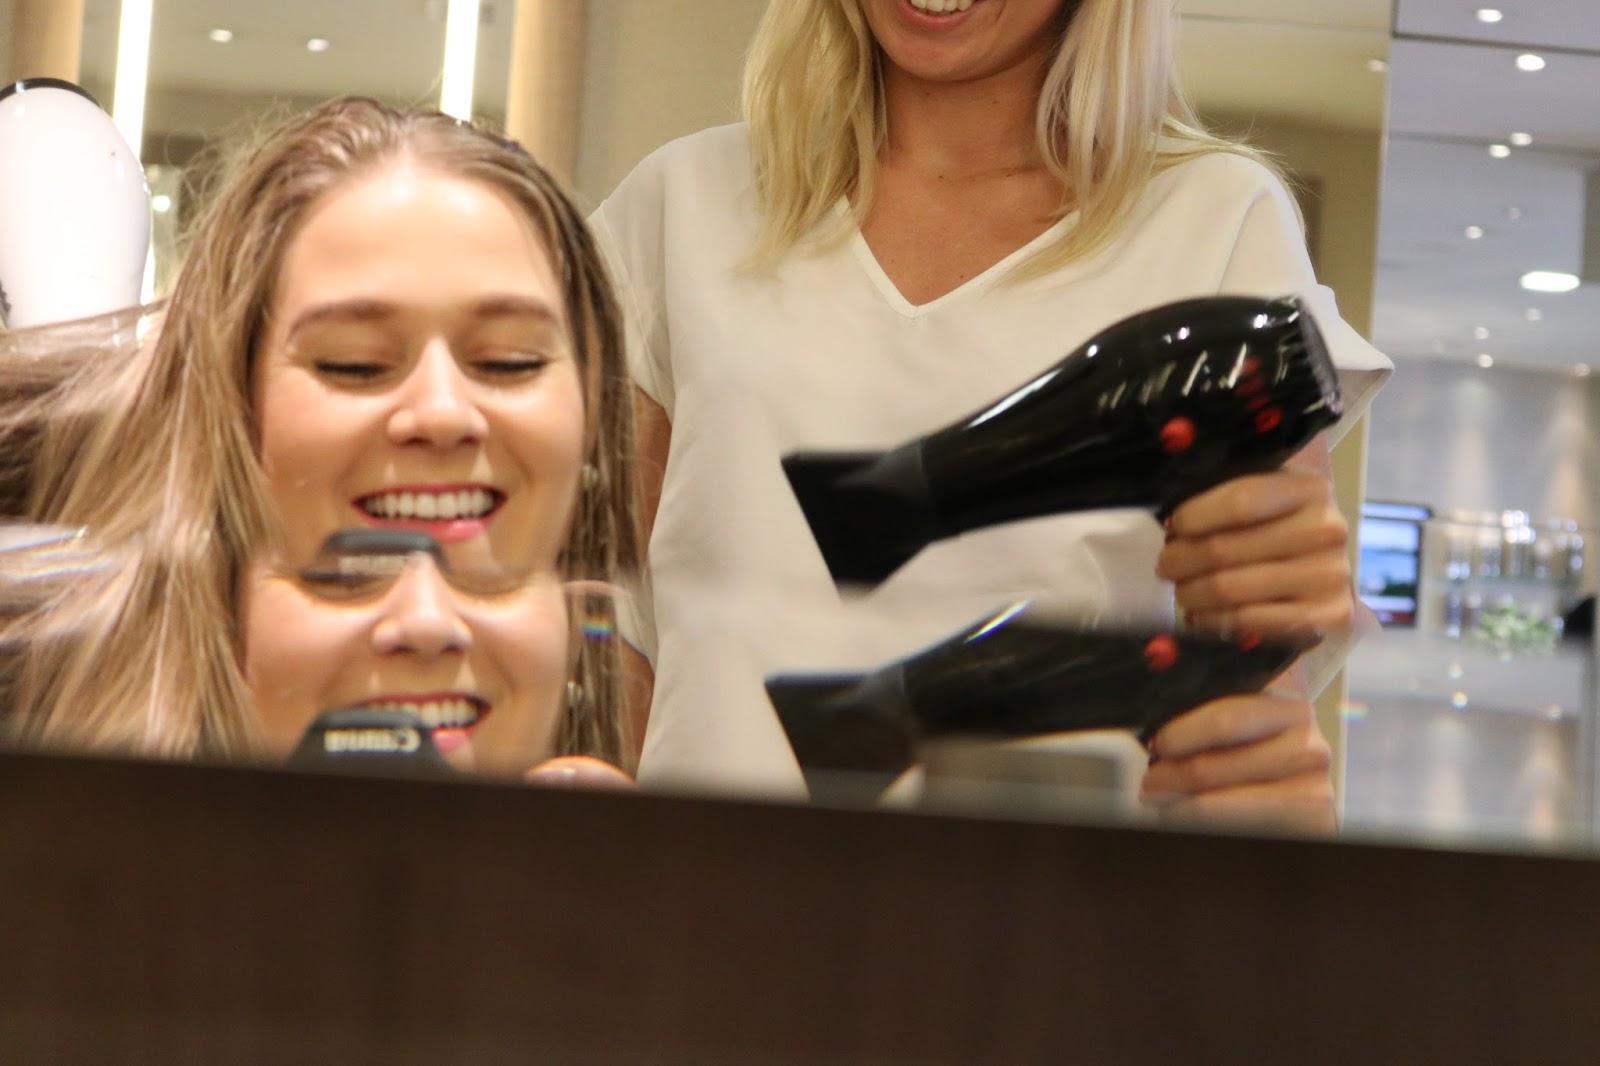 Blonde Girl, Katie Heath with Olaplex Haircare treatment, Hair by Dimitra, Michael John Salon, London